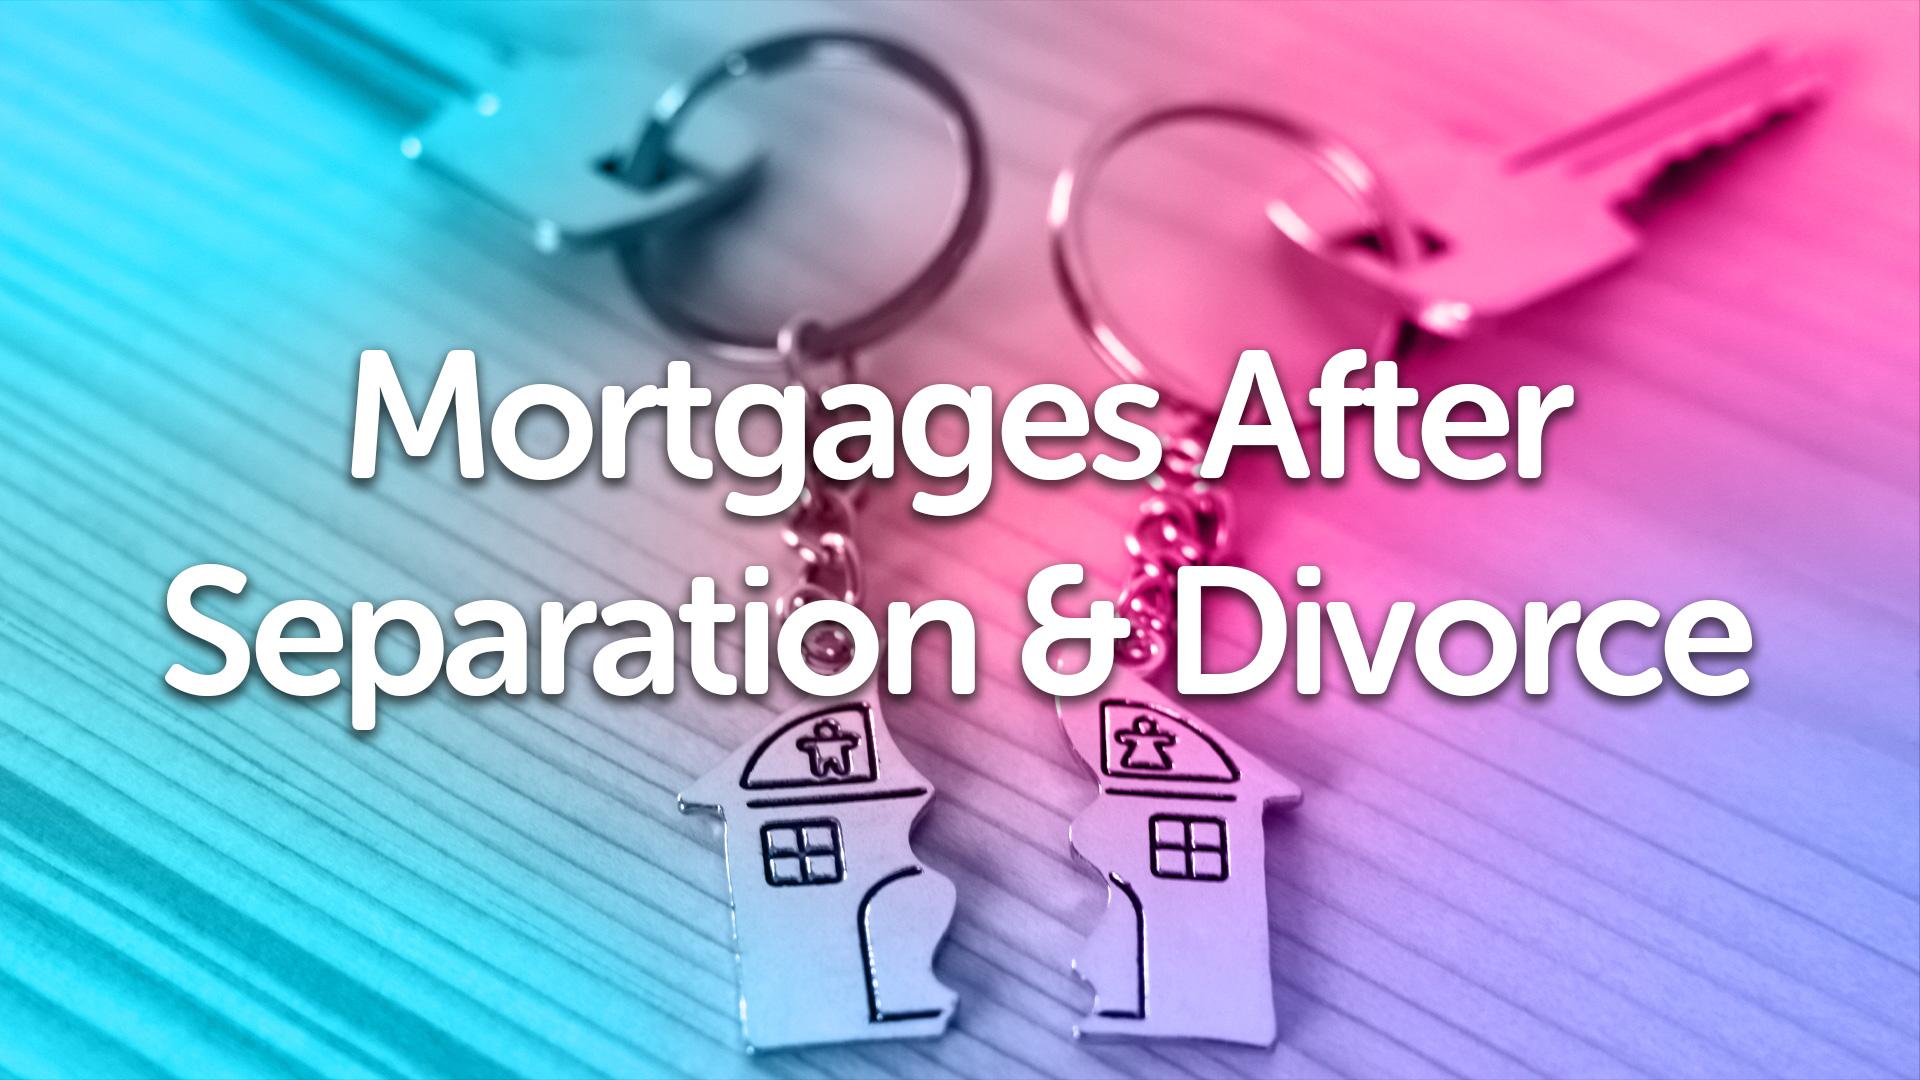 Divorce & Separation Advice